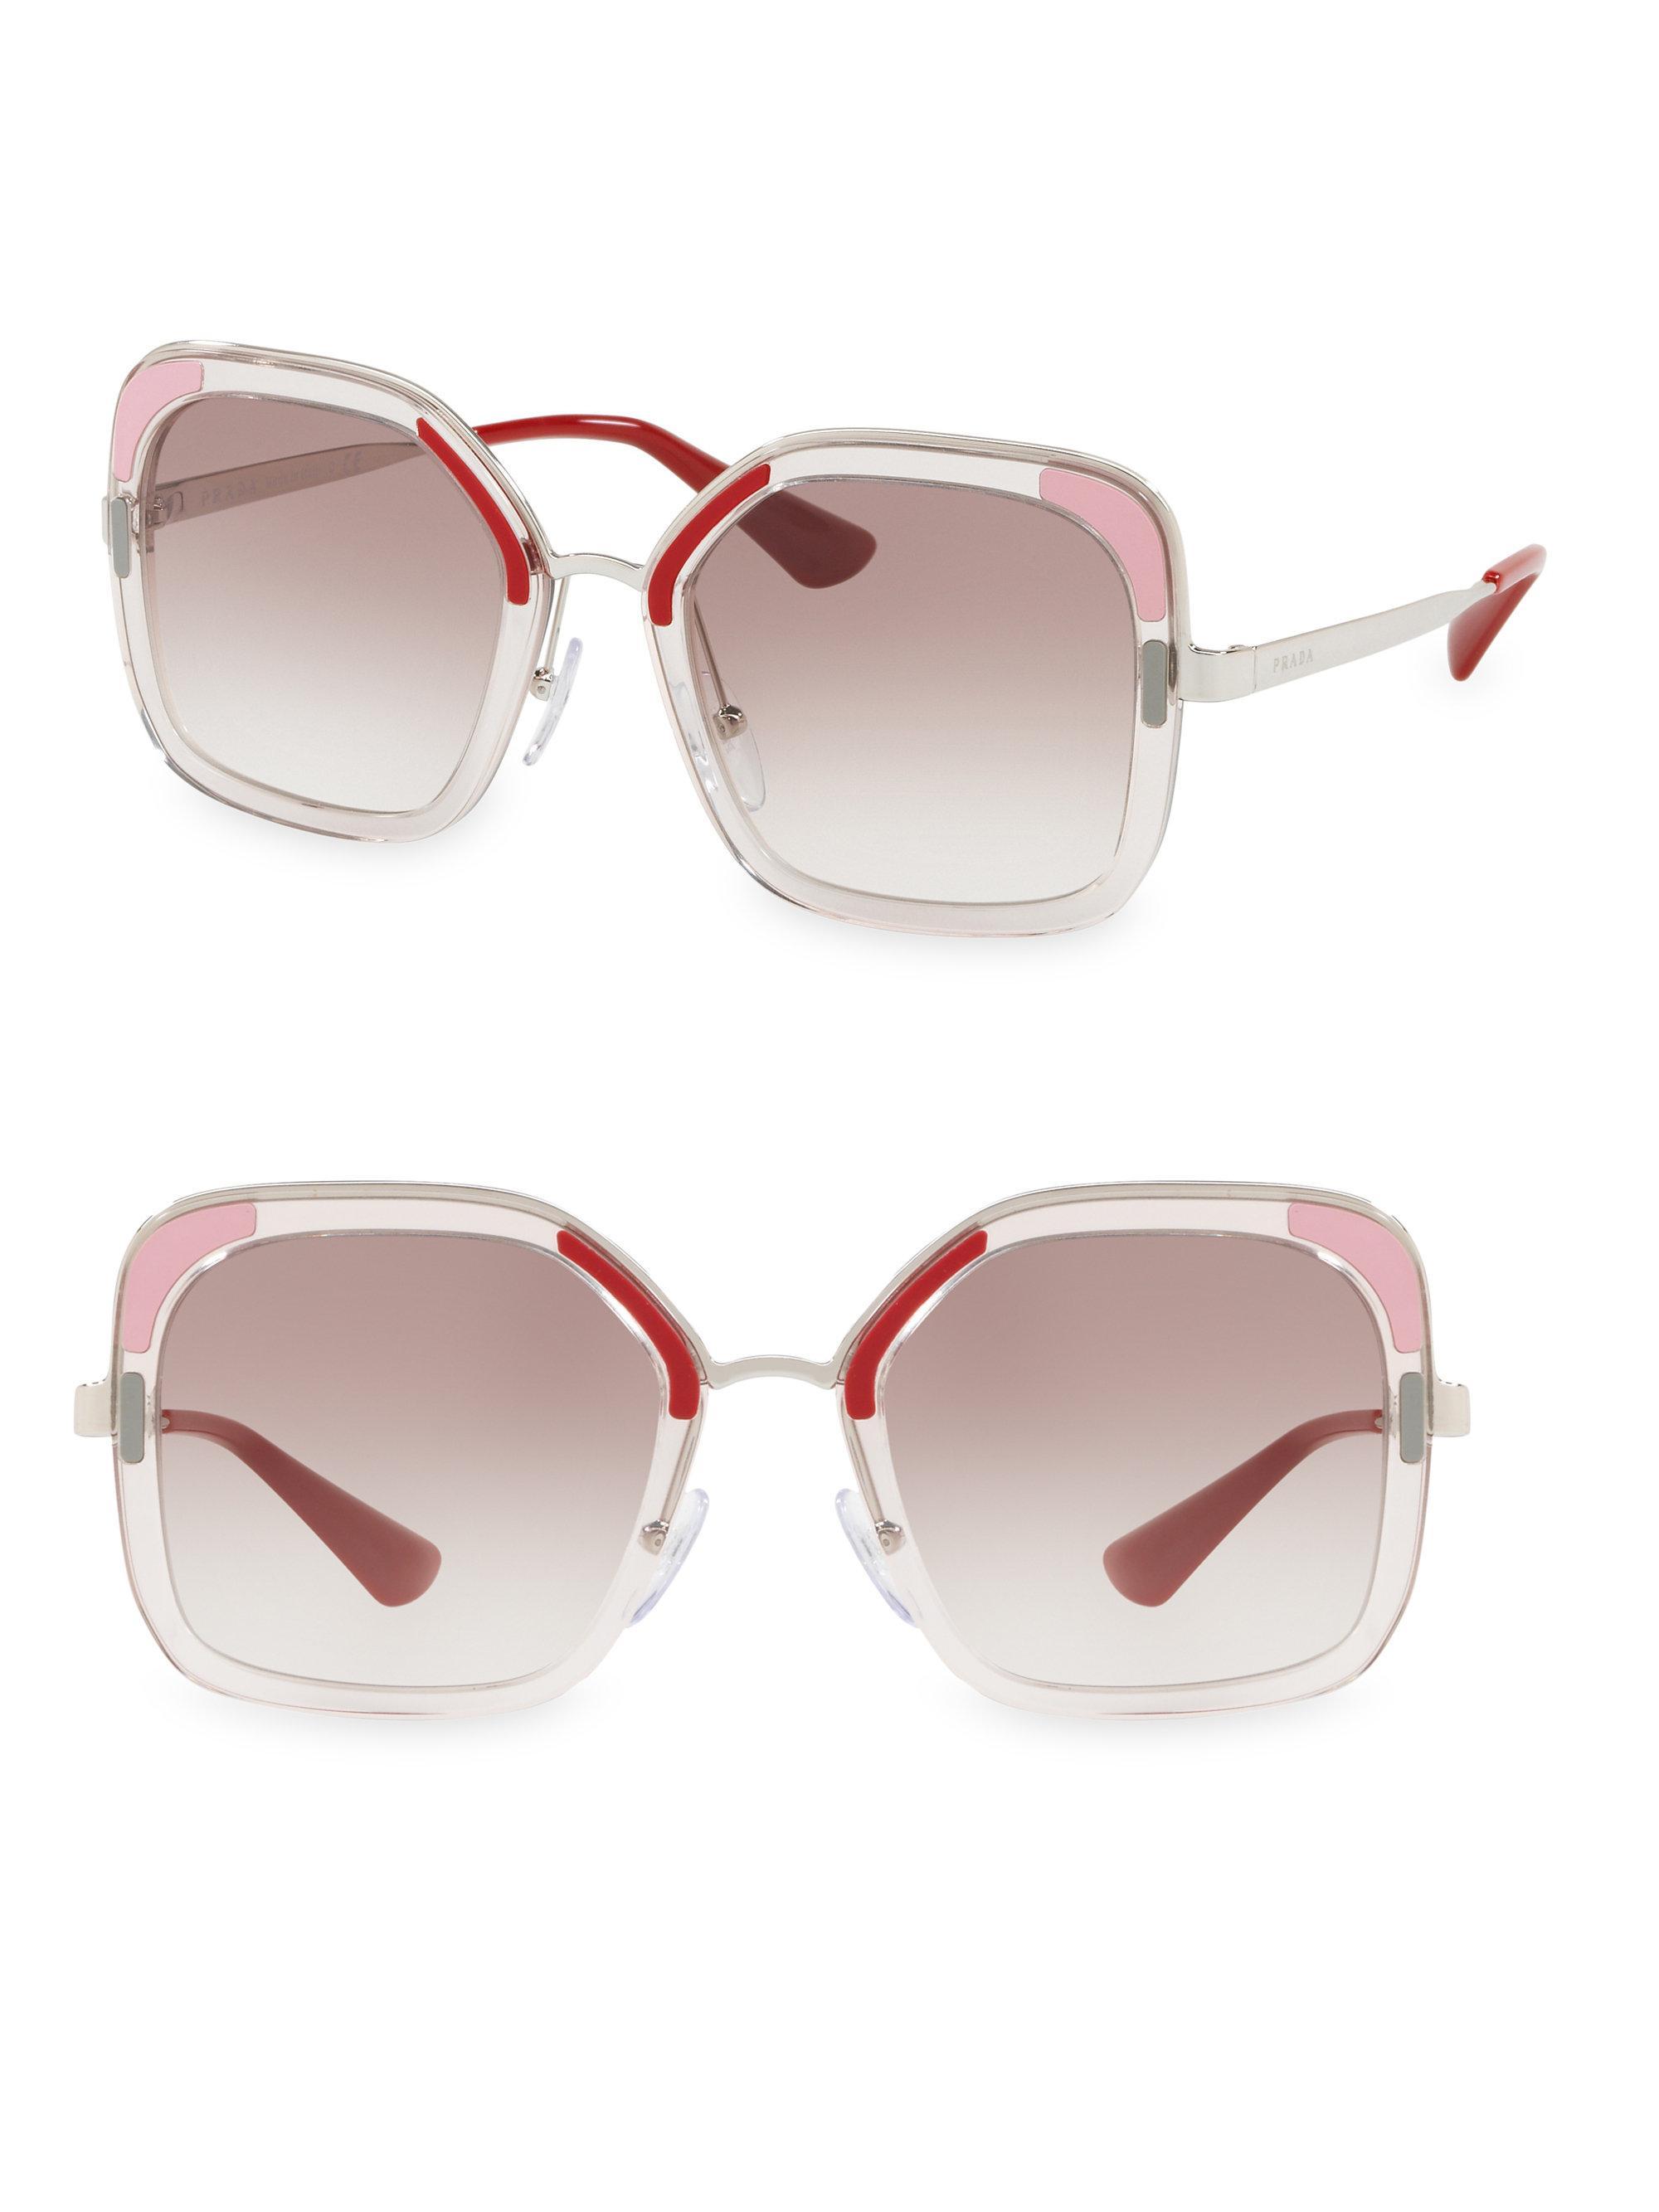 26ba669aa0 ... coupon for prada translucent two tone sunglasses lyst 47fee 20f78